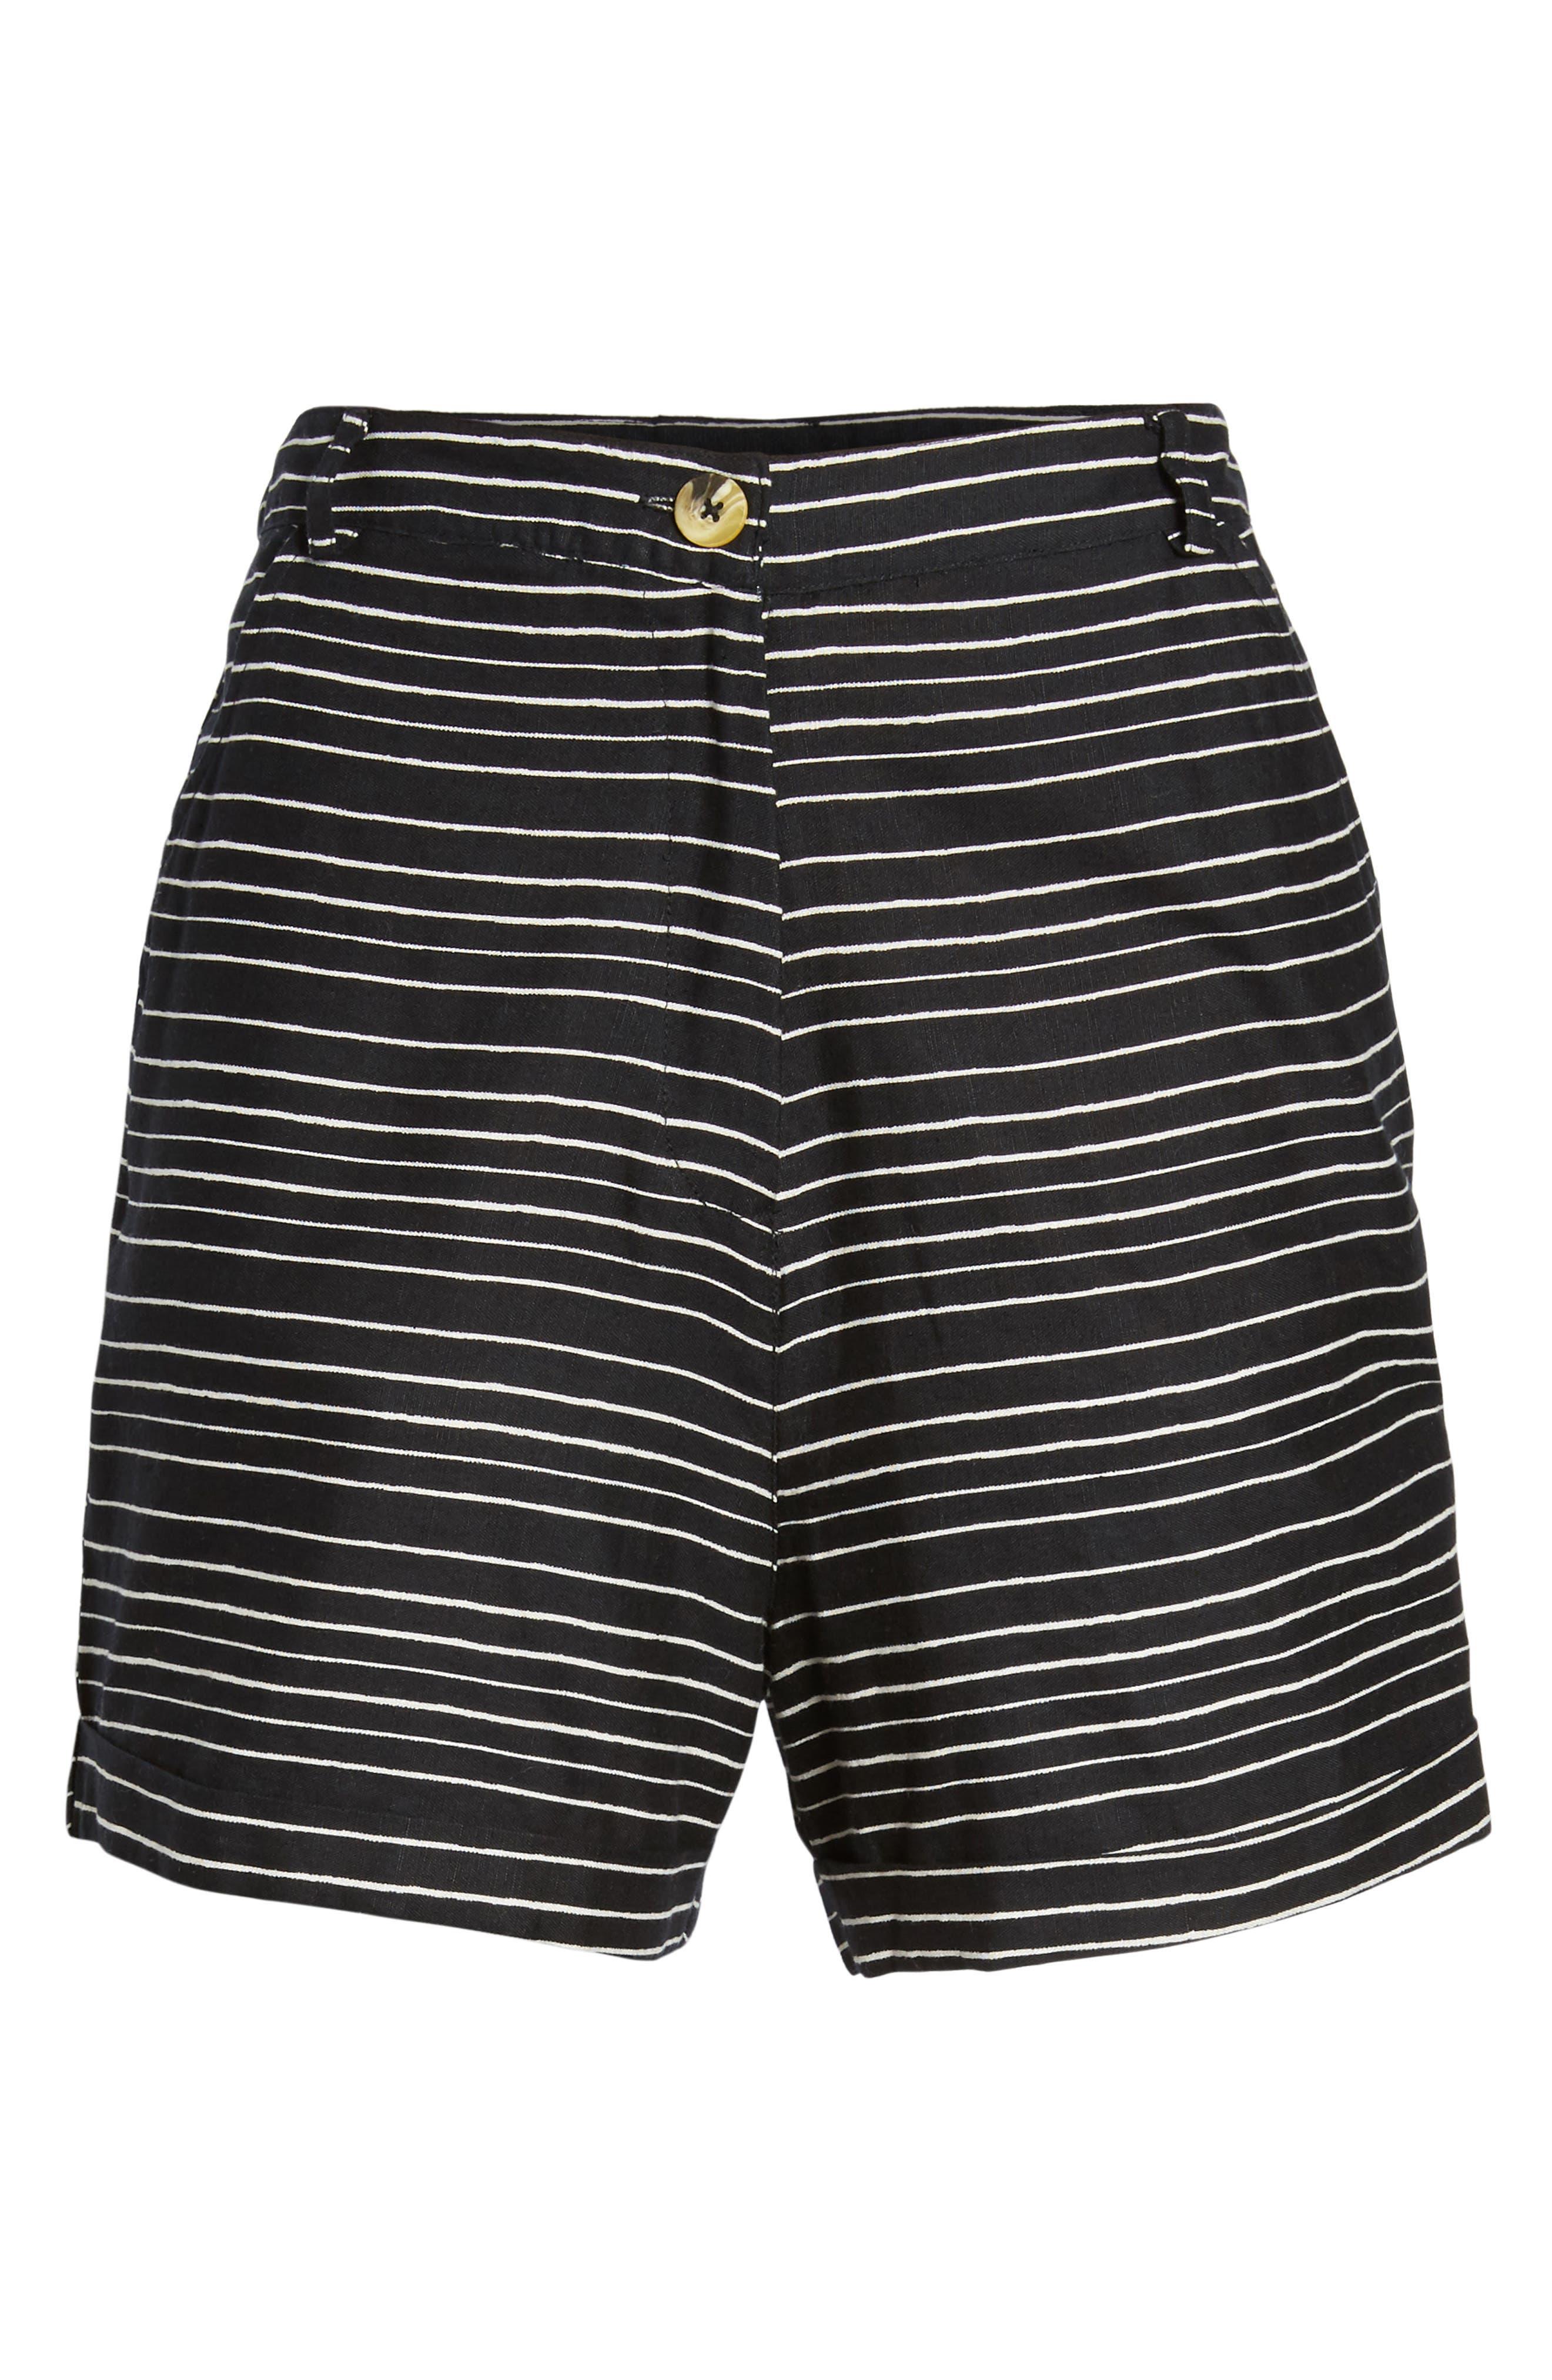 Pin-Up Linen Blend Shorts,                             Alternate thumbnail 6, color,                             Black